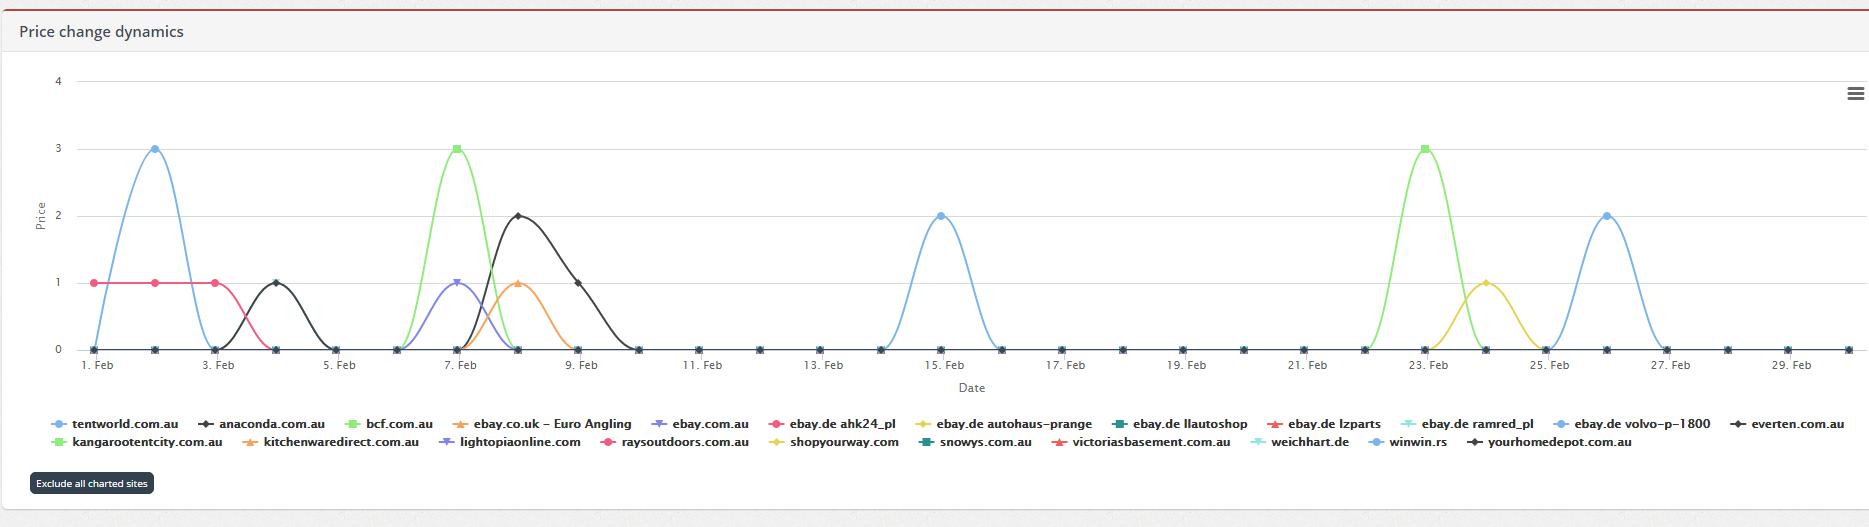 new chart price change dynamics